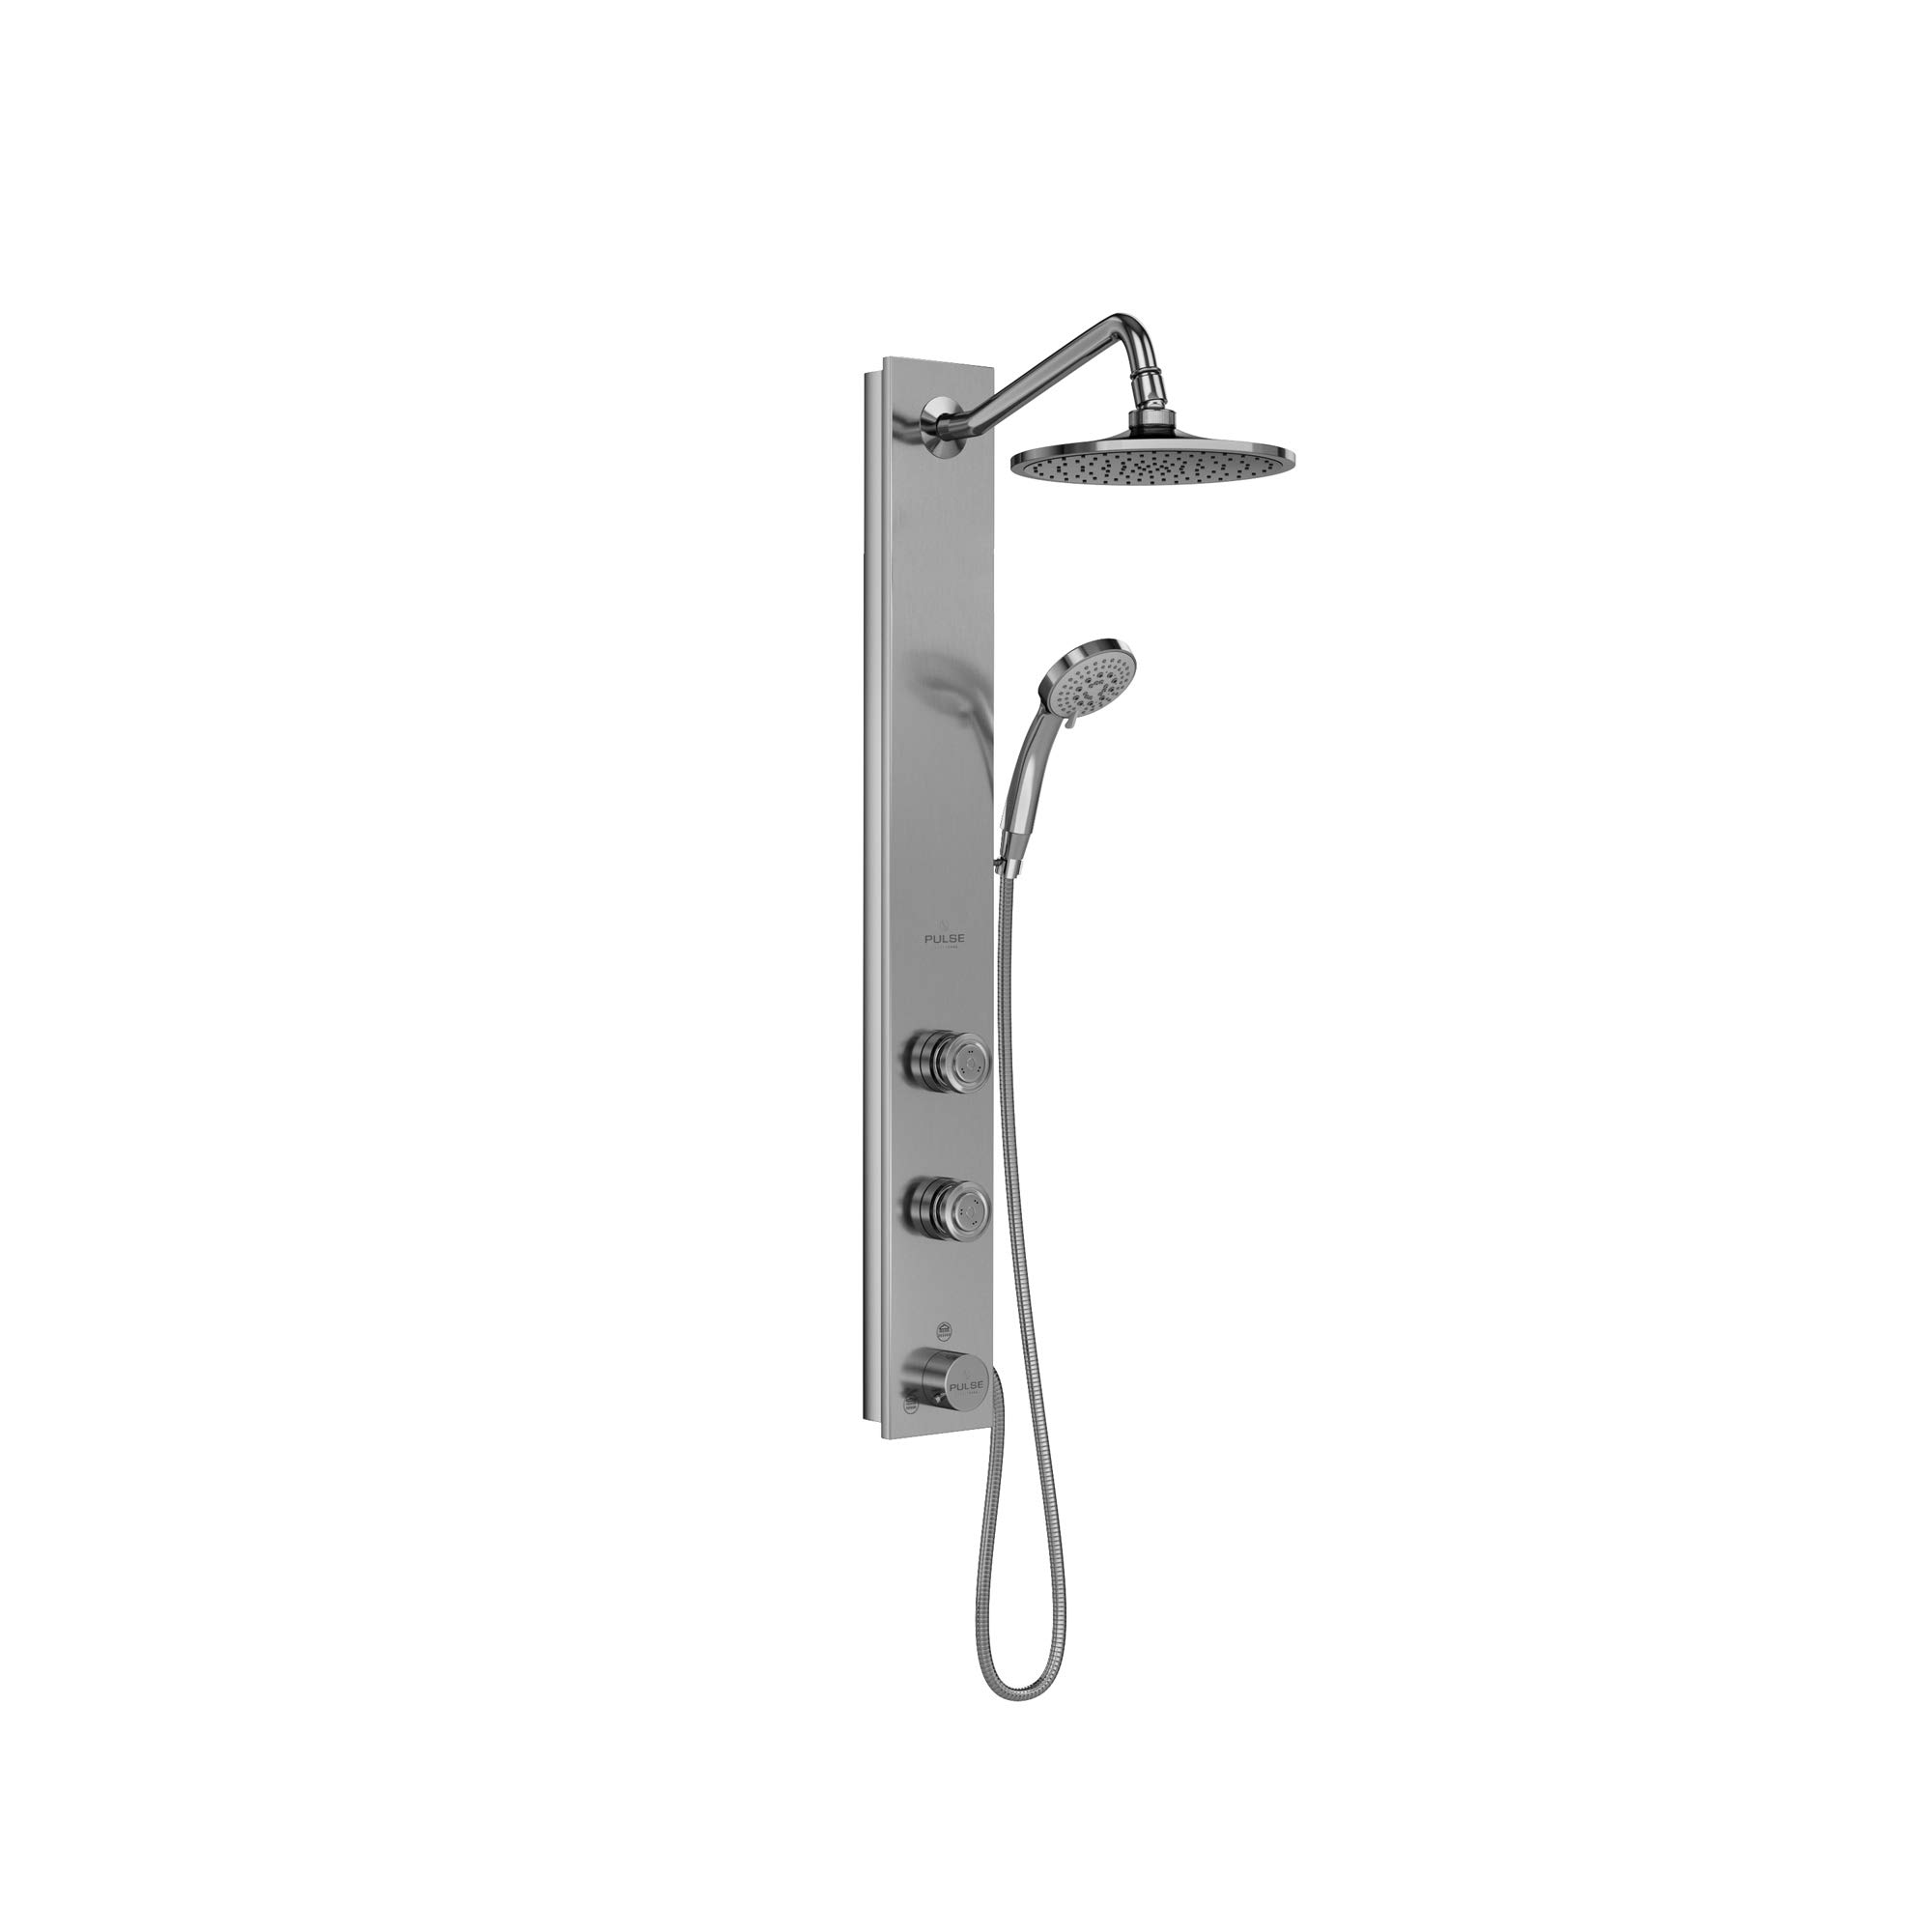 PULSE ShowerSpas 1021 SSB Showerhead Pulsating